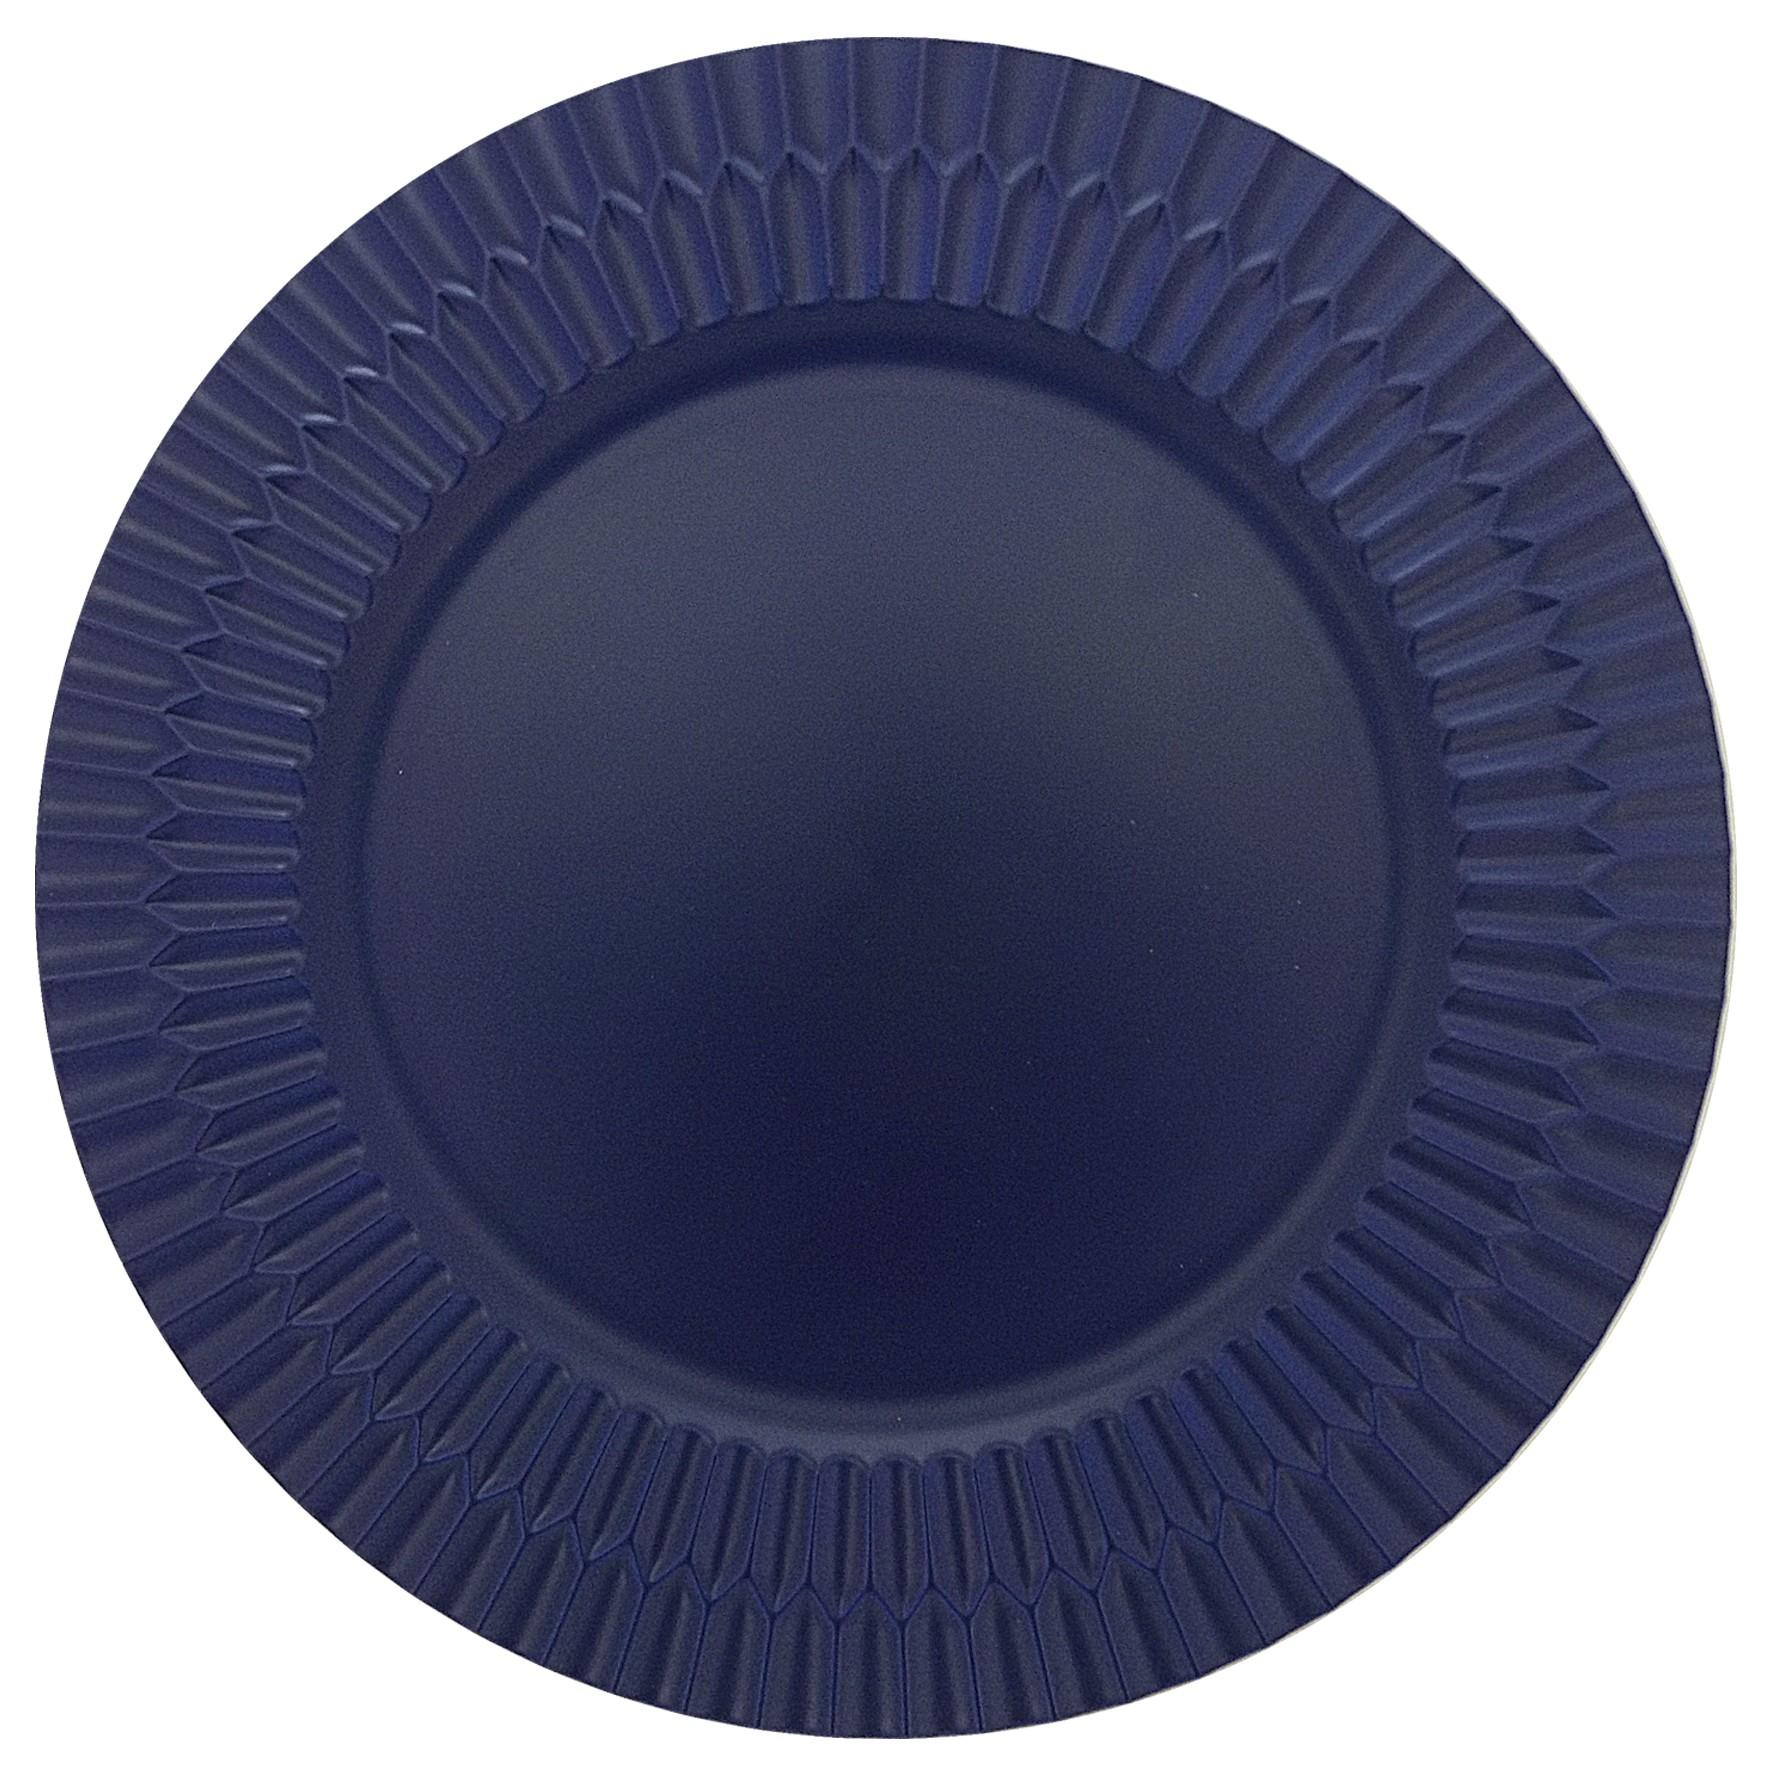 Sousplat Layers Plastico 33cm Azul Royal - Mimo Style